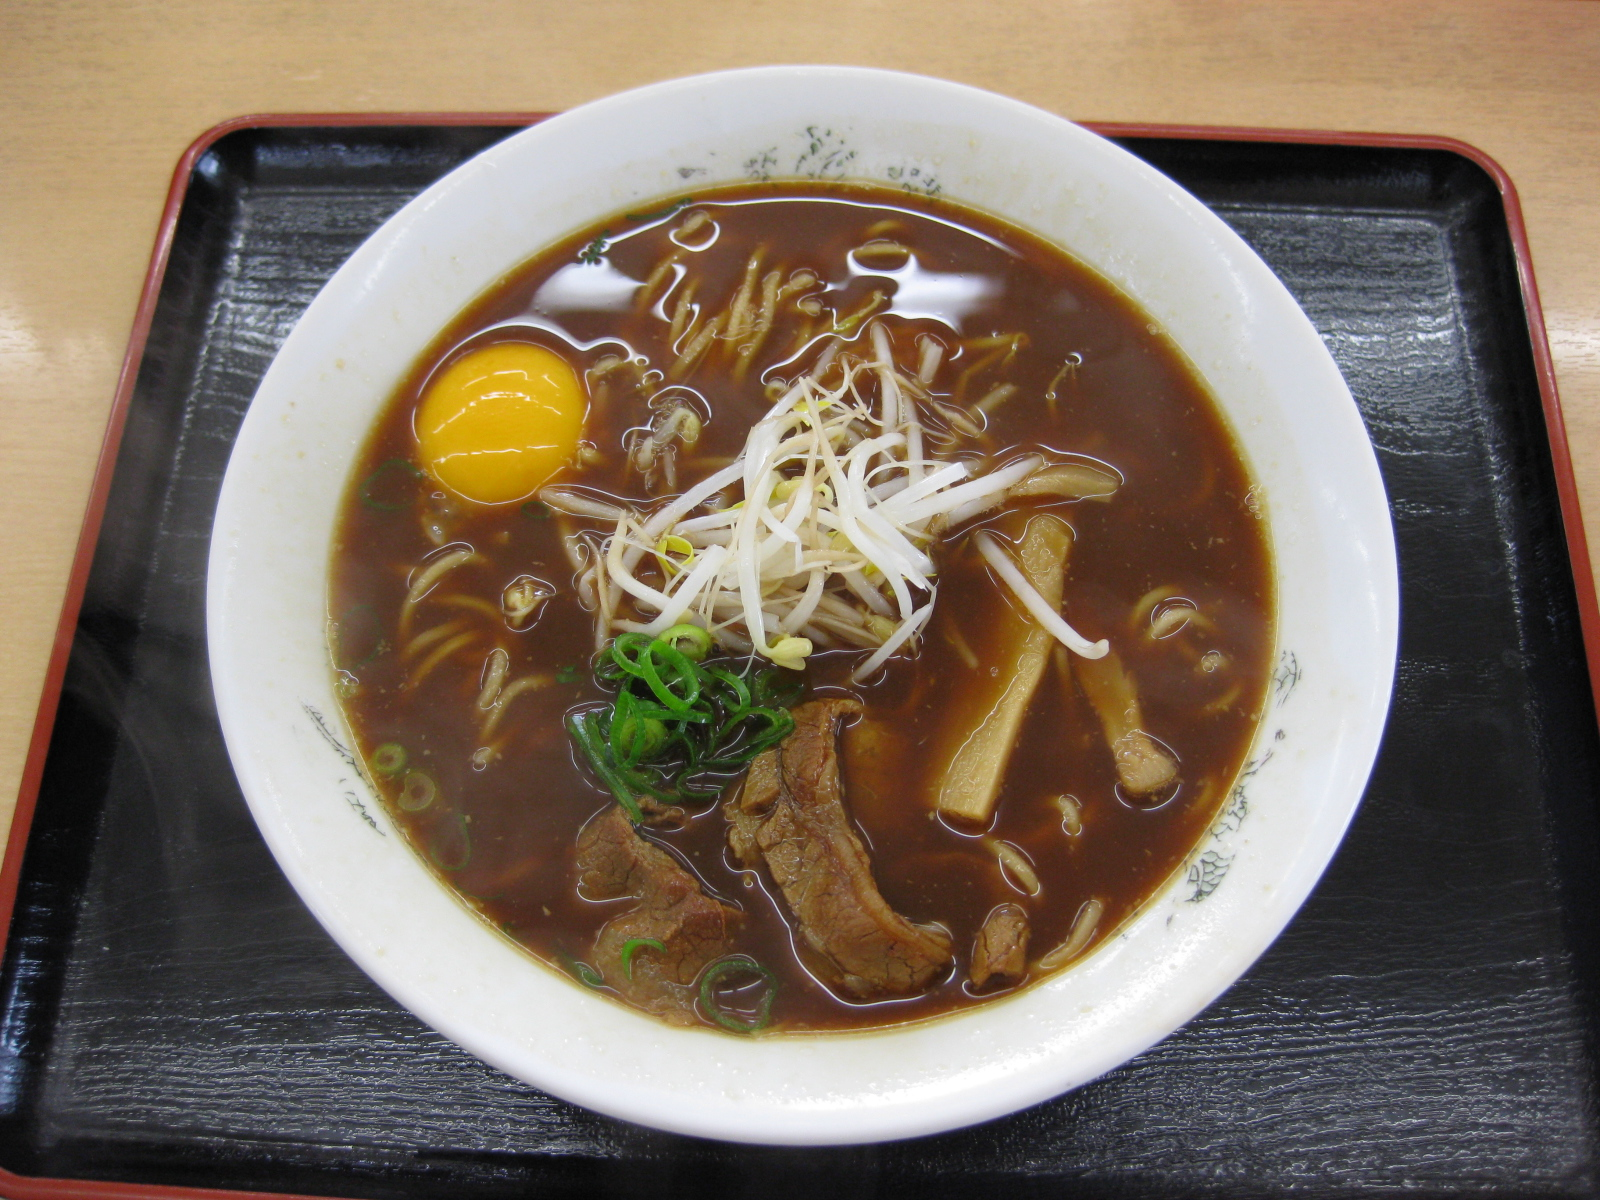 IMG_1288 ラーメン気ままに食べ歩き : 支那そば 青空@板野郡藍住町